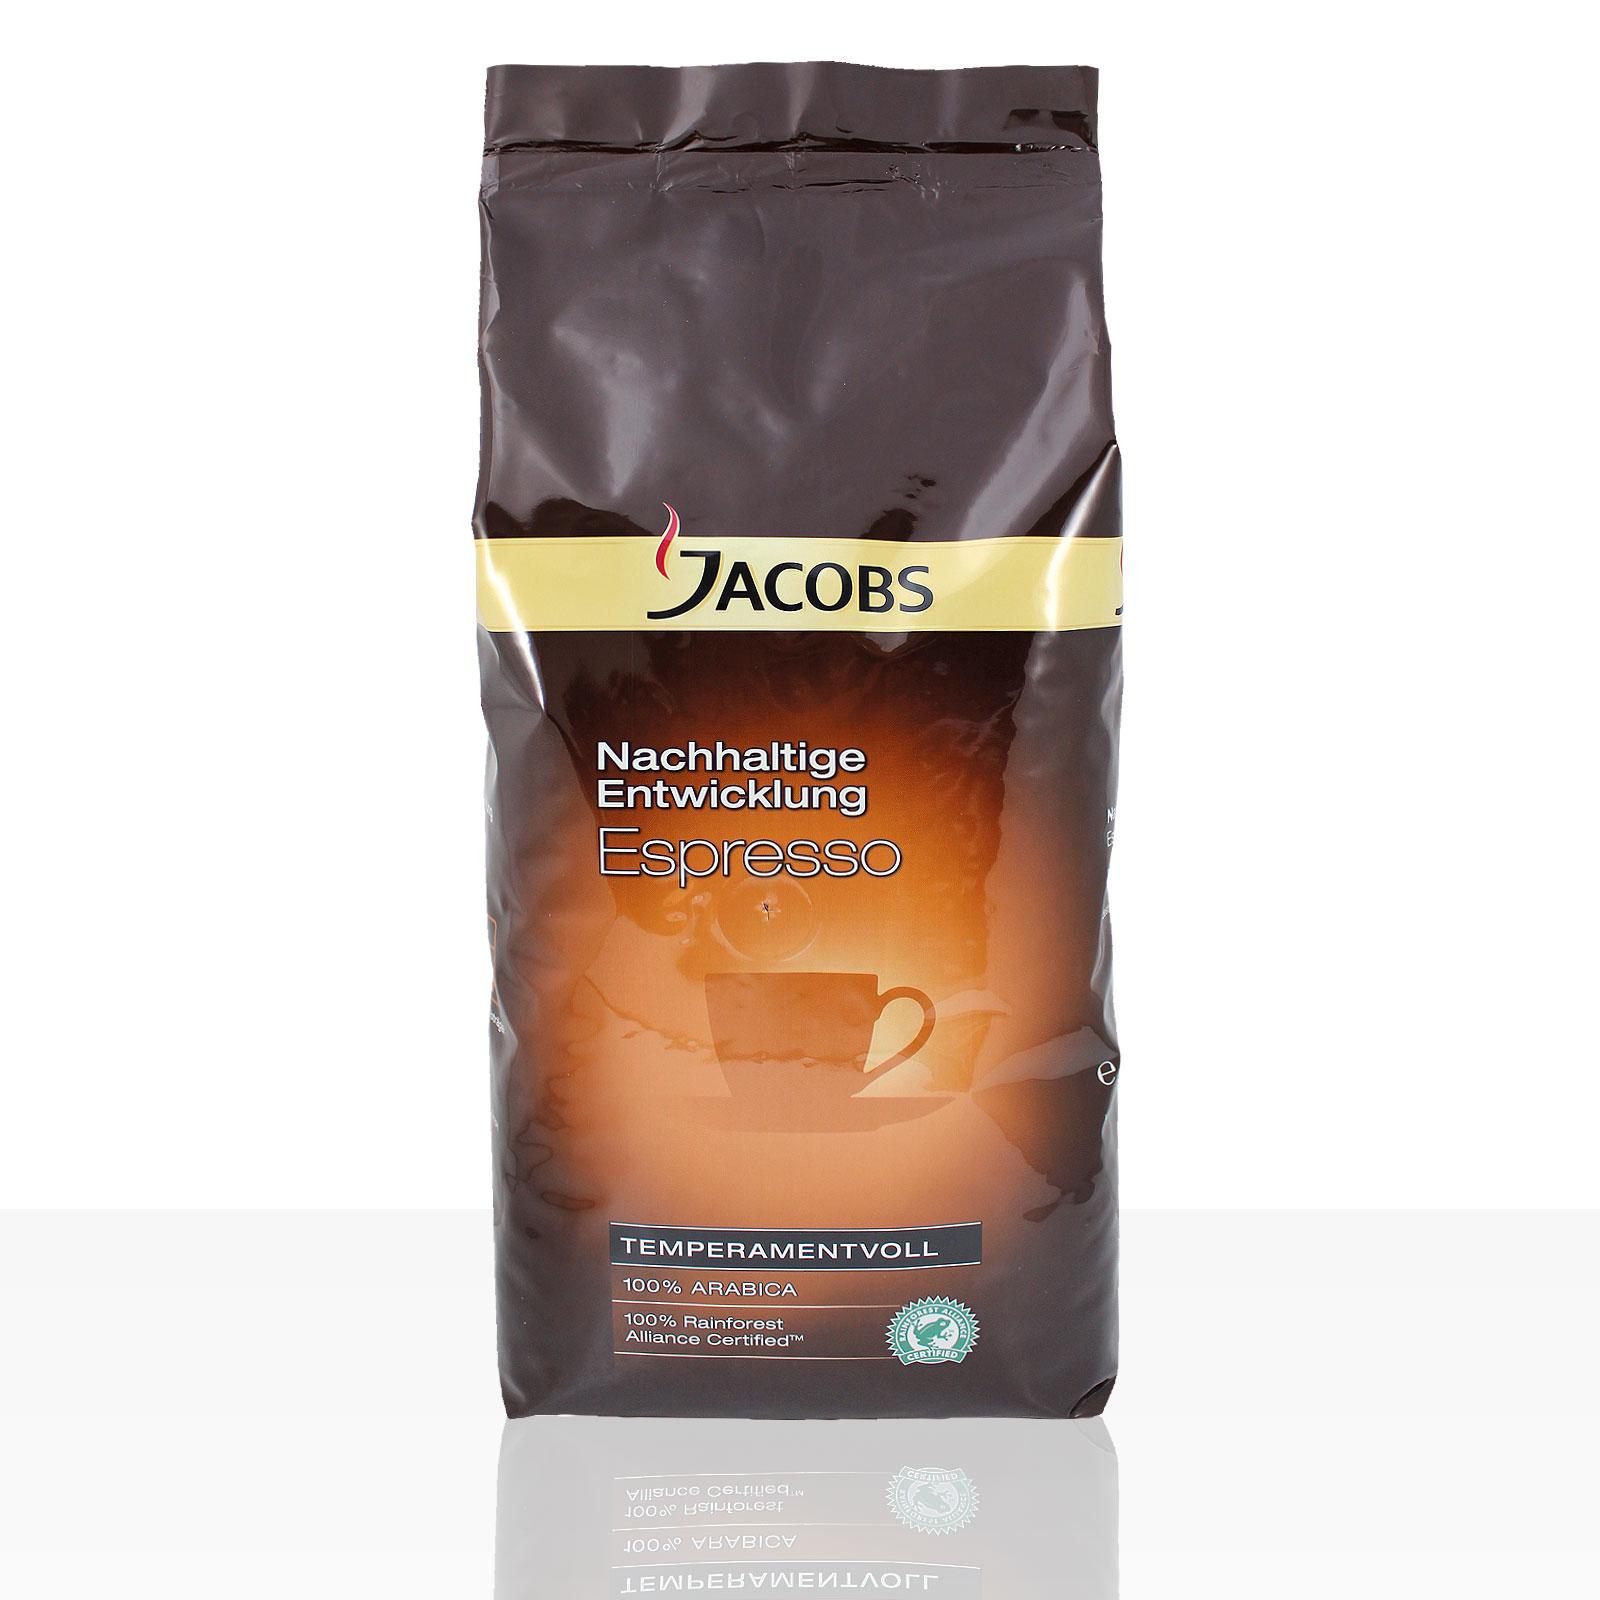 Jacobs Nachhaltige Entwicklung Espresso - 8 x 1kg ganze Kaffee-Bohne, 100% Arabica